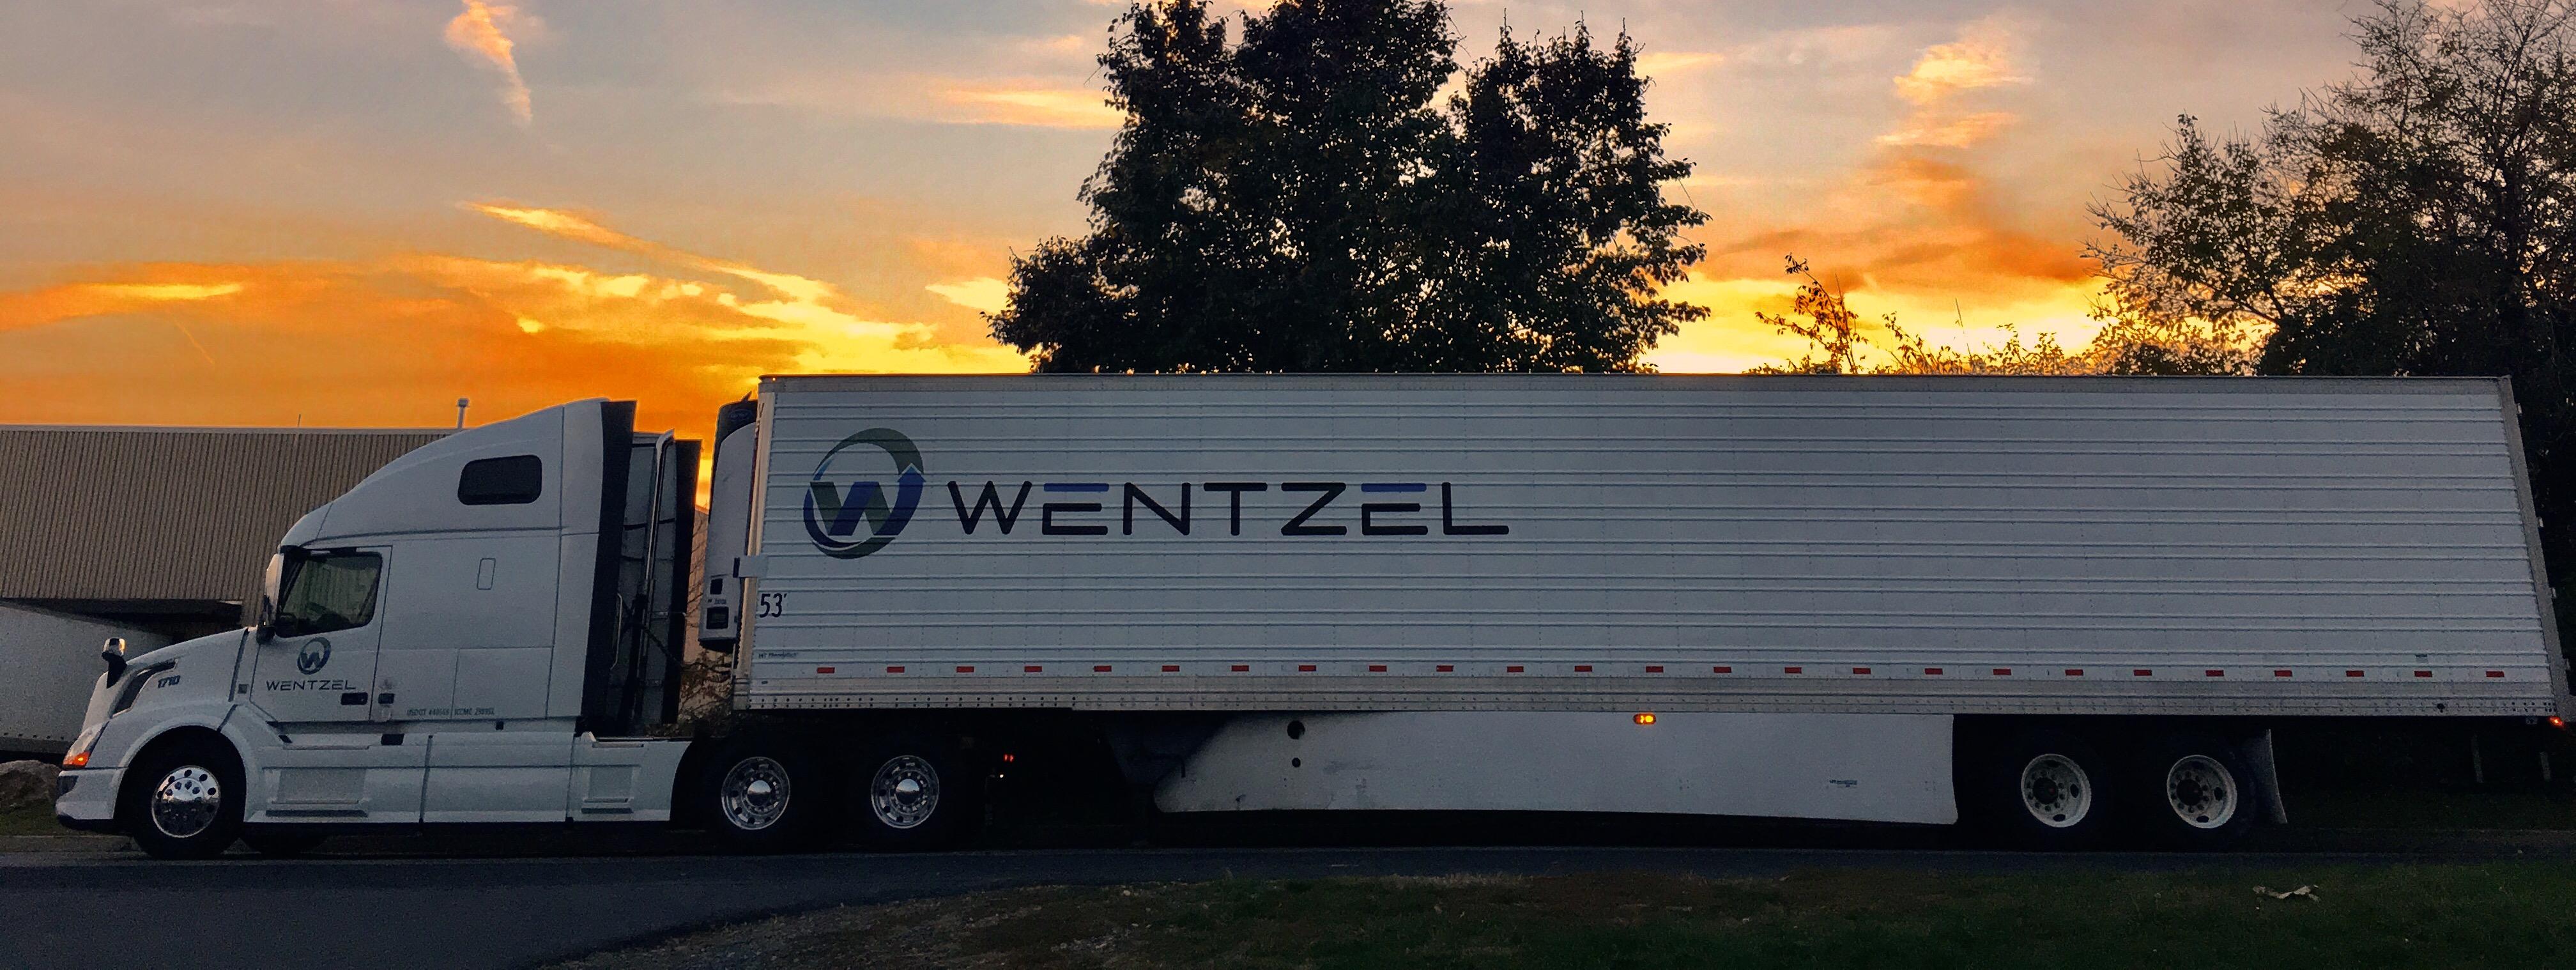 Wentzel Transportation